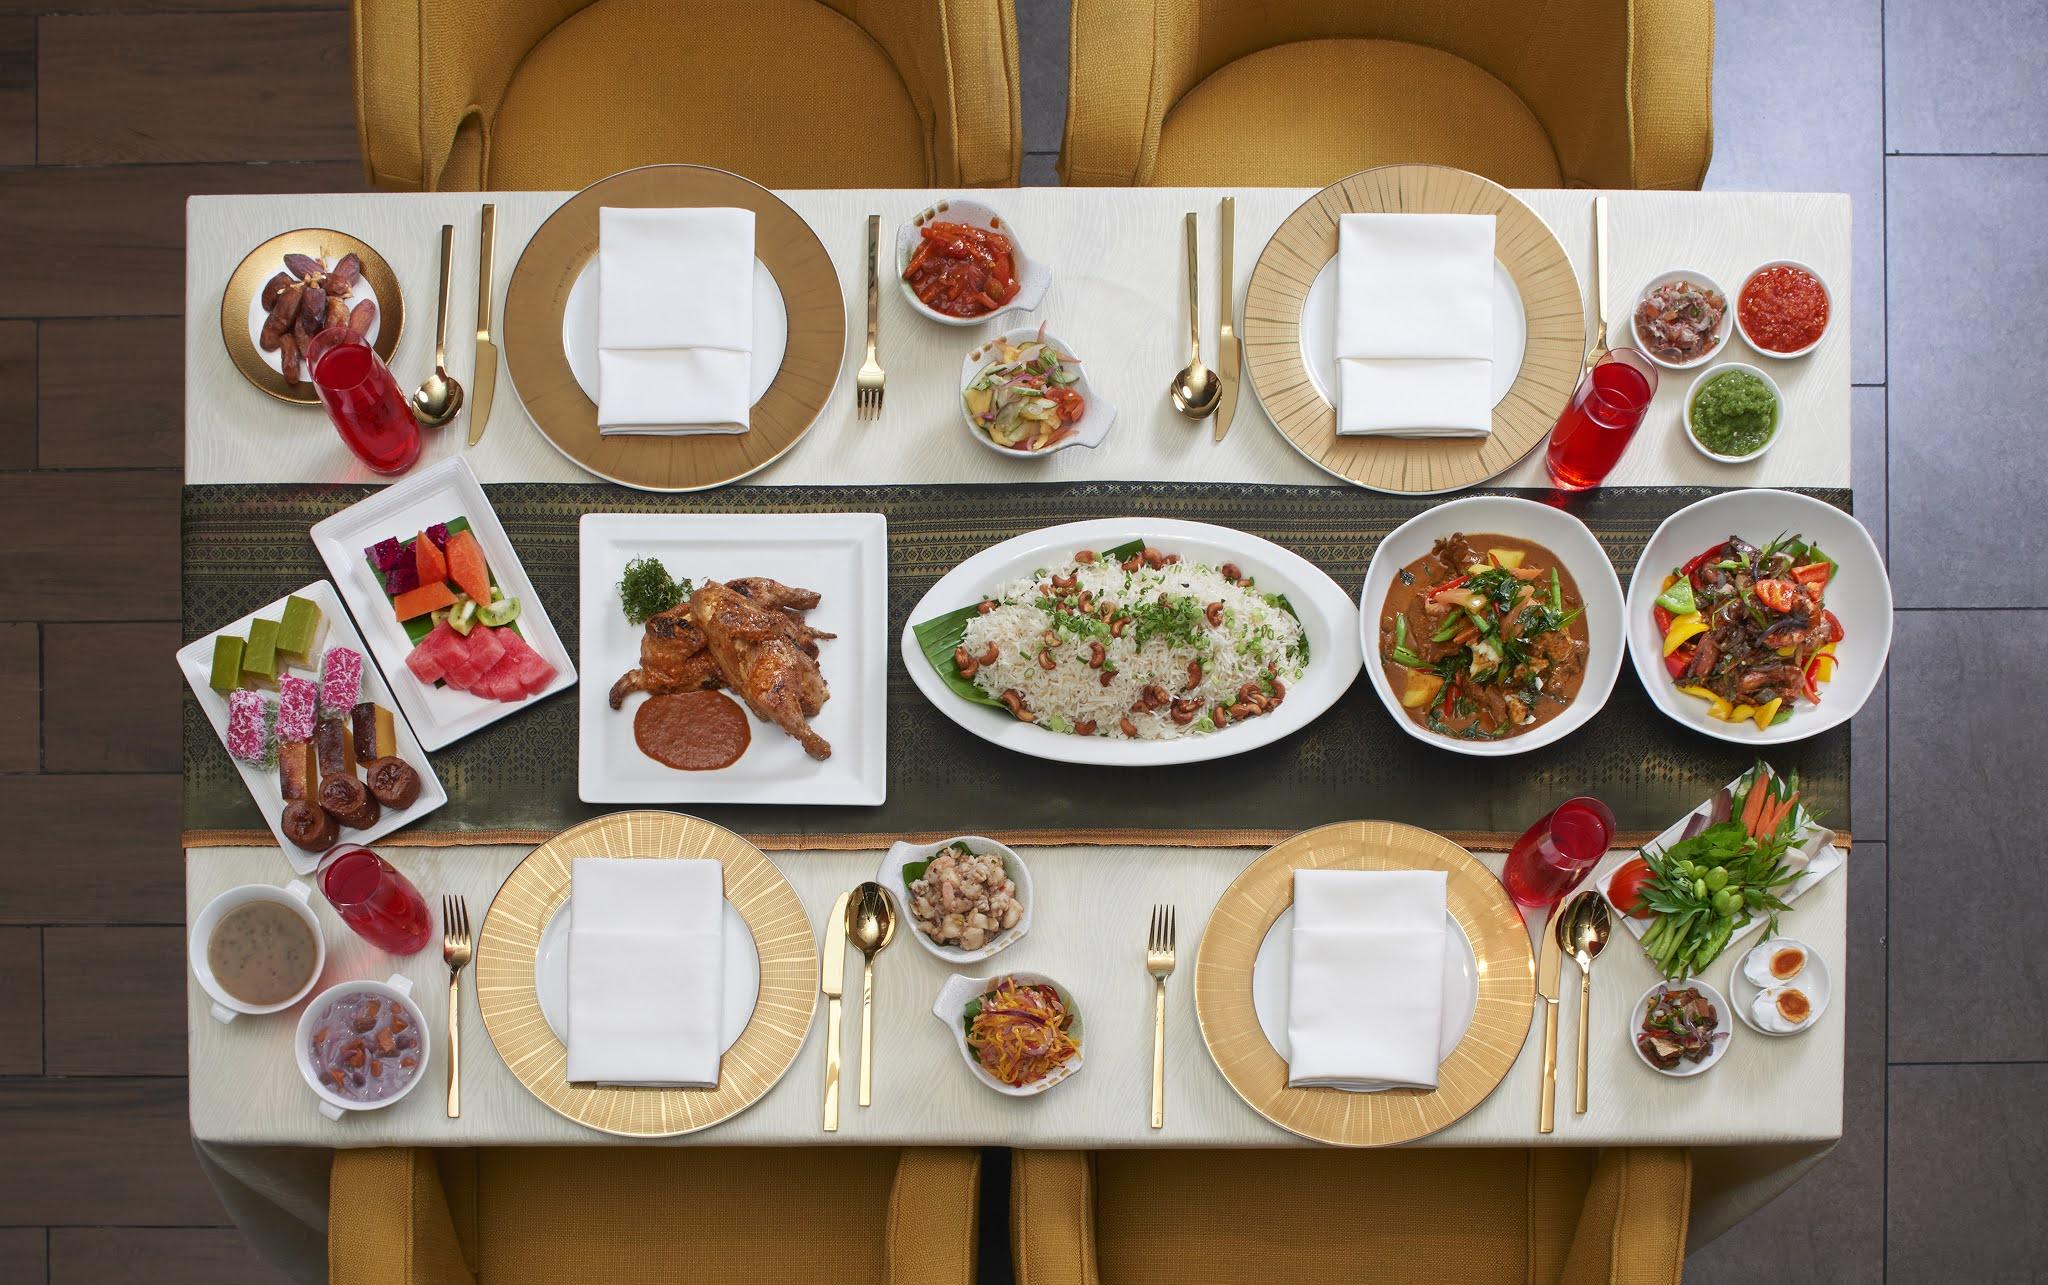 sheraton petaling jaya hotel: ramadan 2021 takeaways, deliveries & buffets